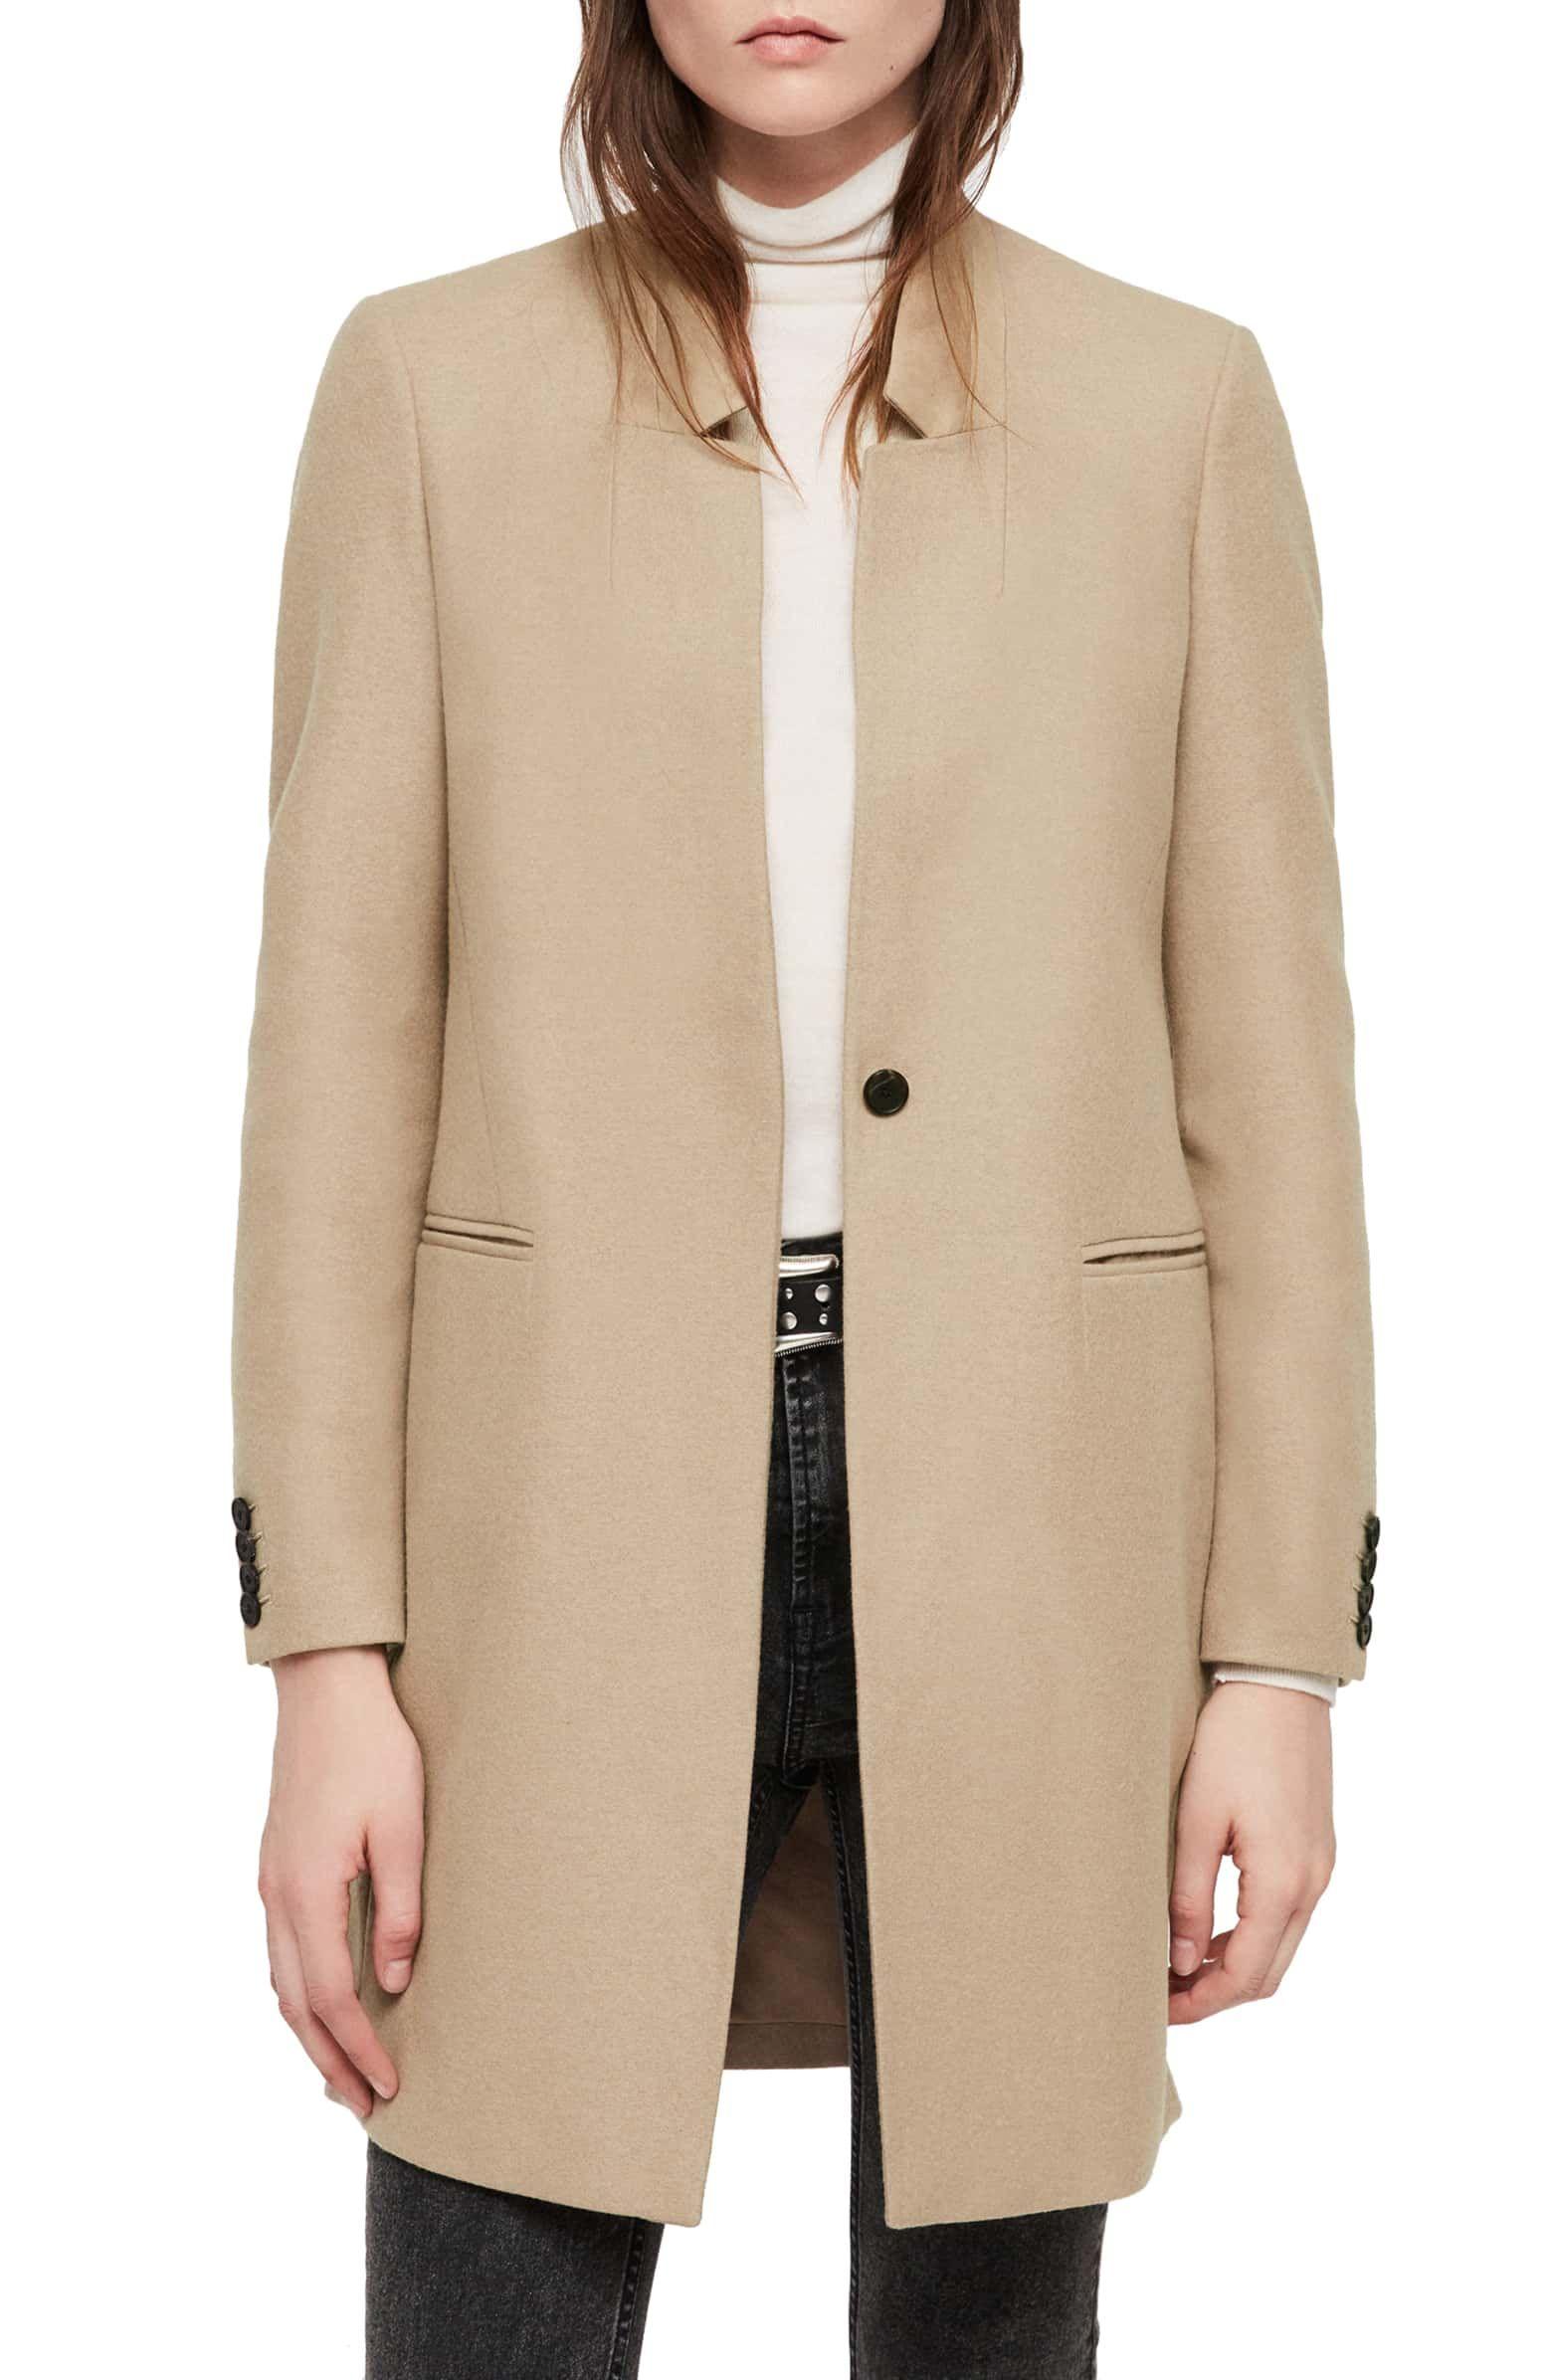 Allsaints Lyla Wool Blend Coat Nordstrom Blazer Outfits For Women Coat Collared Coat [ 2392 x 1560 Pixel ]